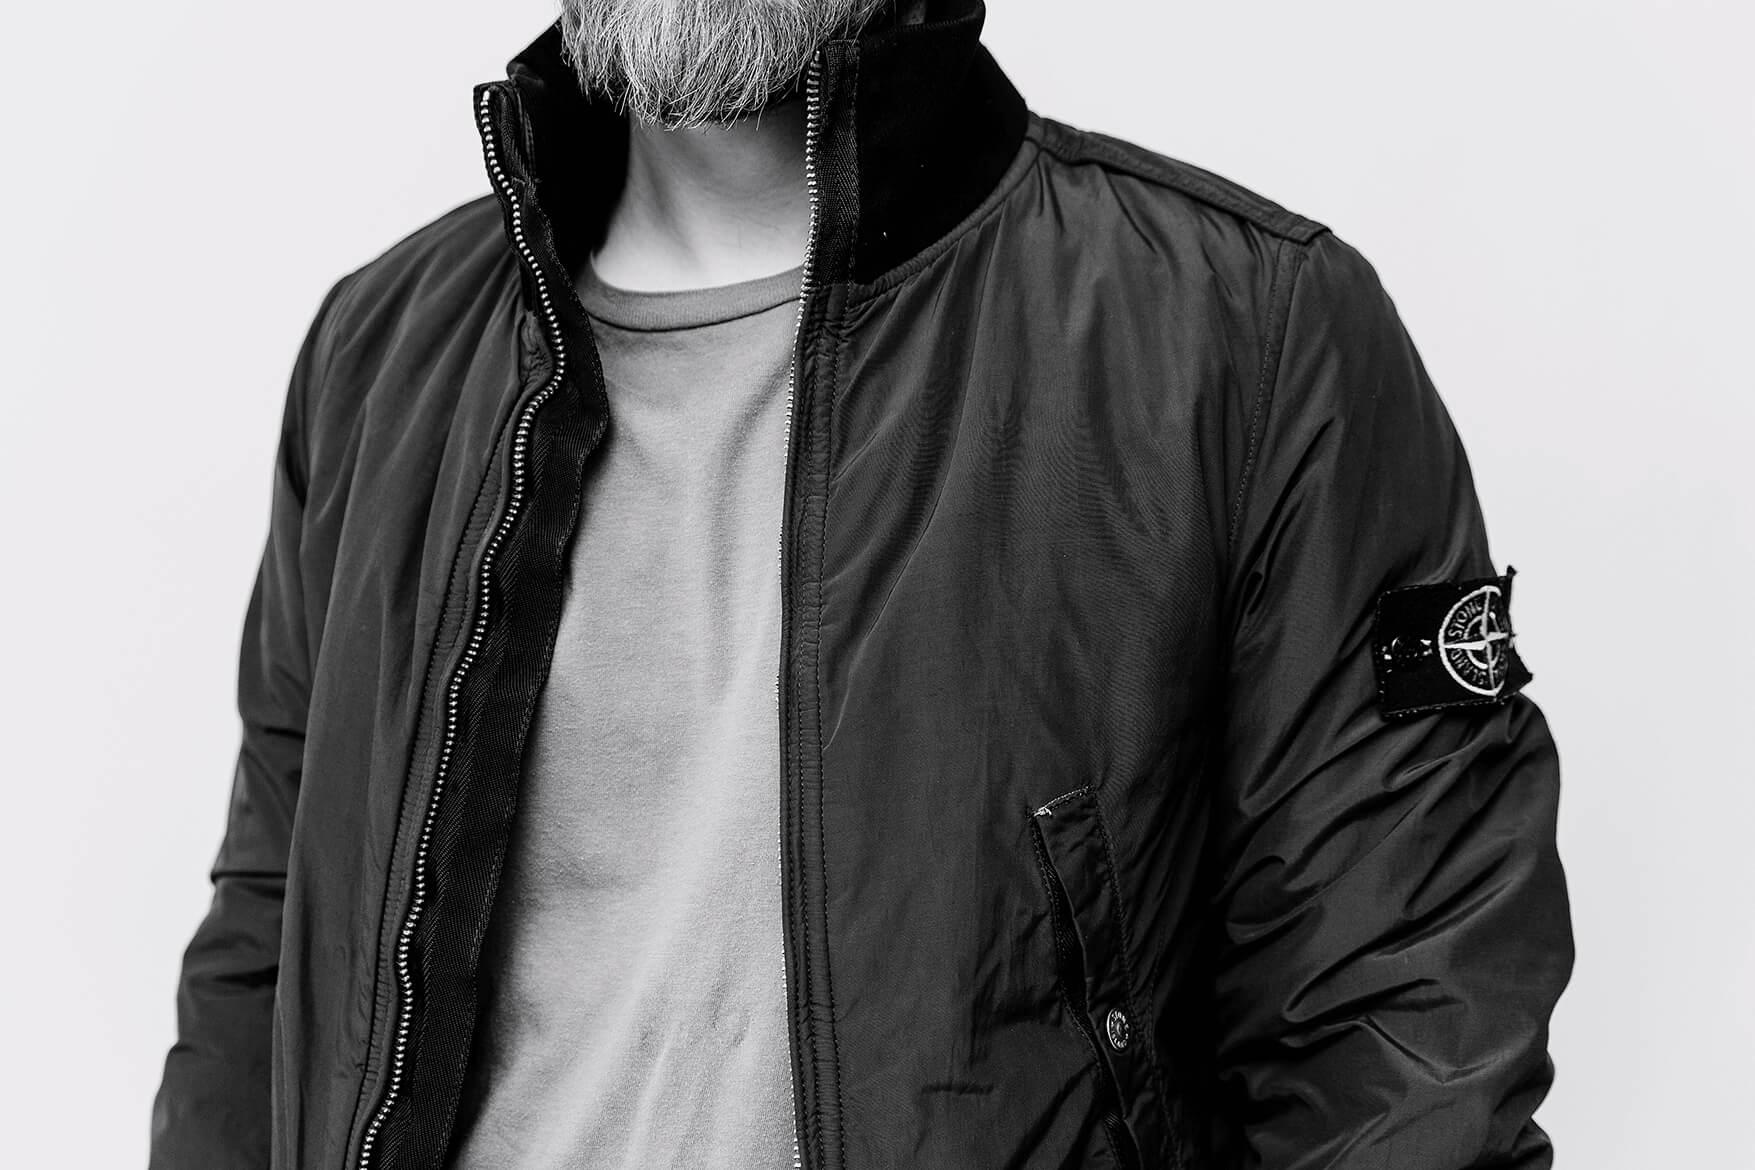 vyriska-apranga-originalus-dizaineriu-drabuziai-vyrams